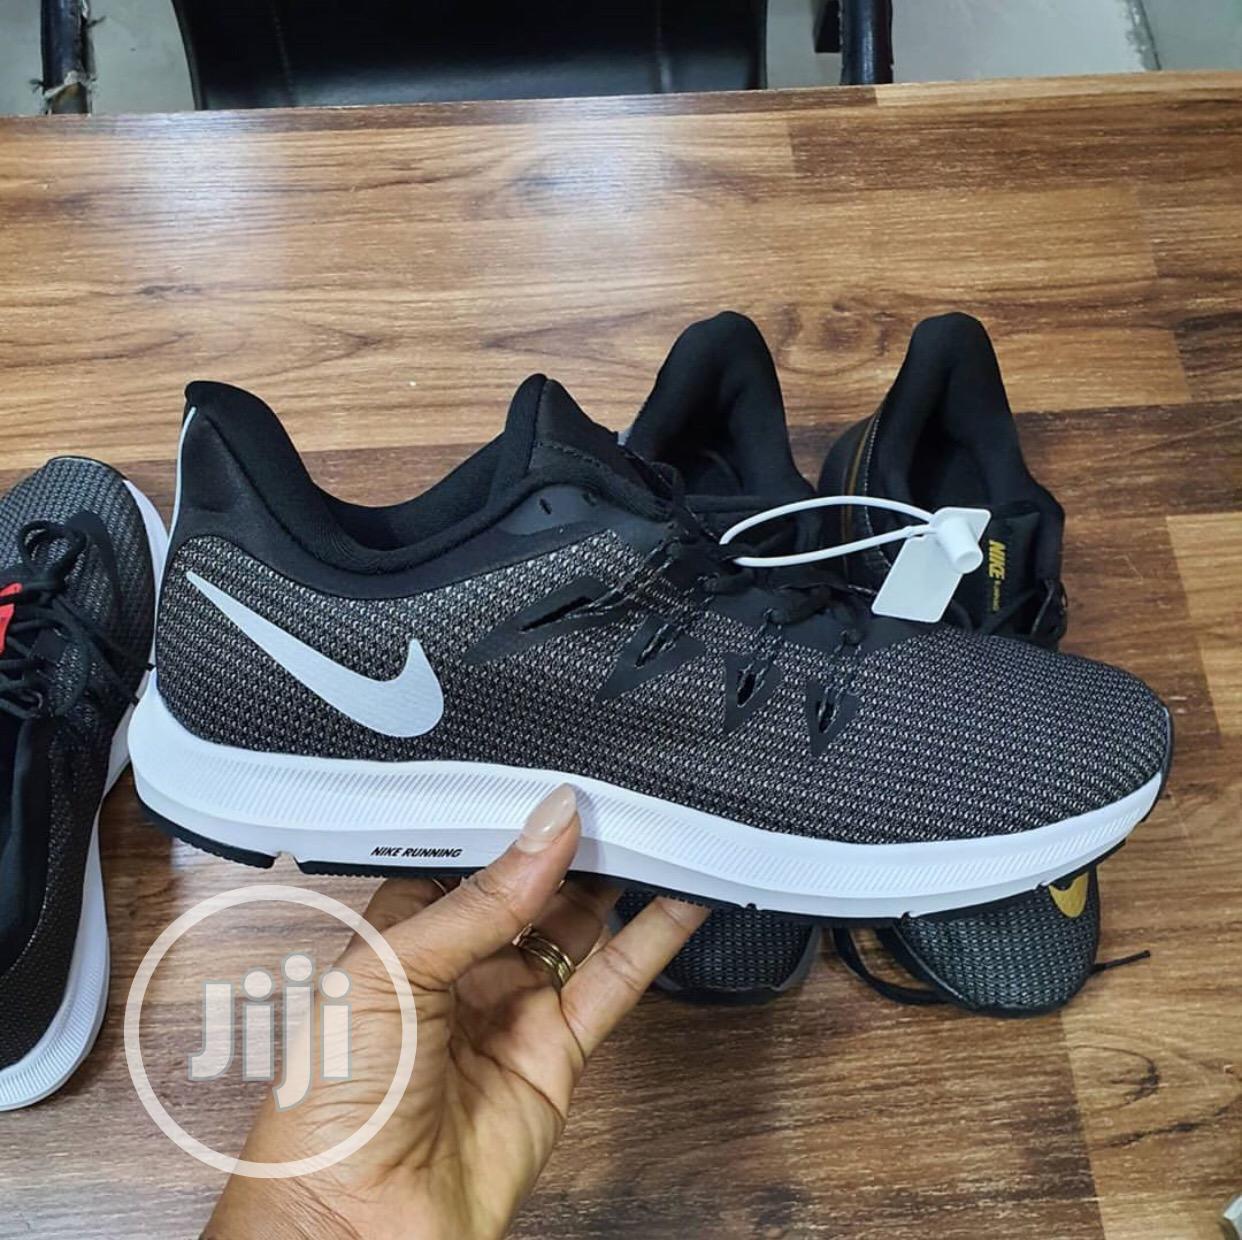 High Quality Nike Running Shoe